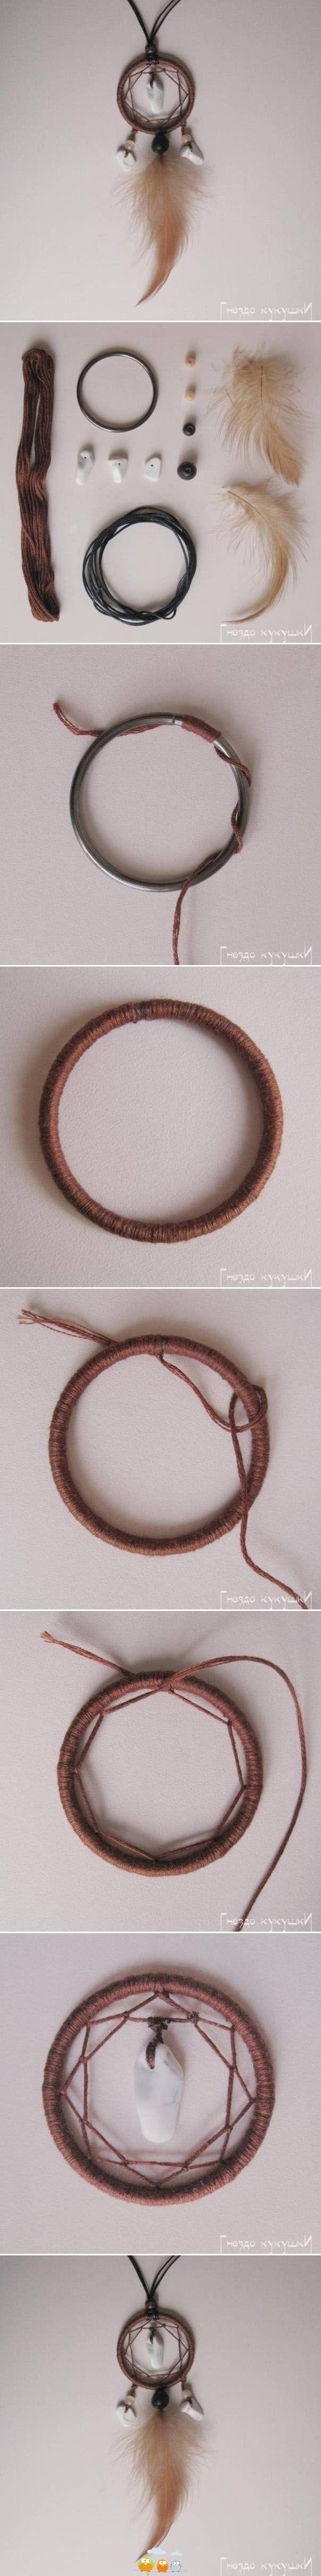 DIY Dream Catcher Necklace